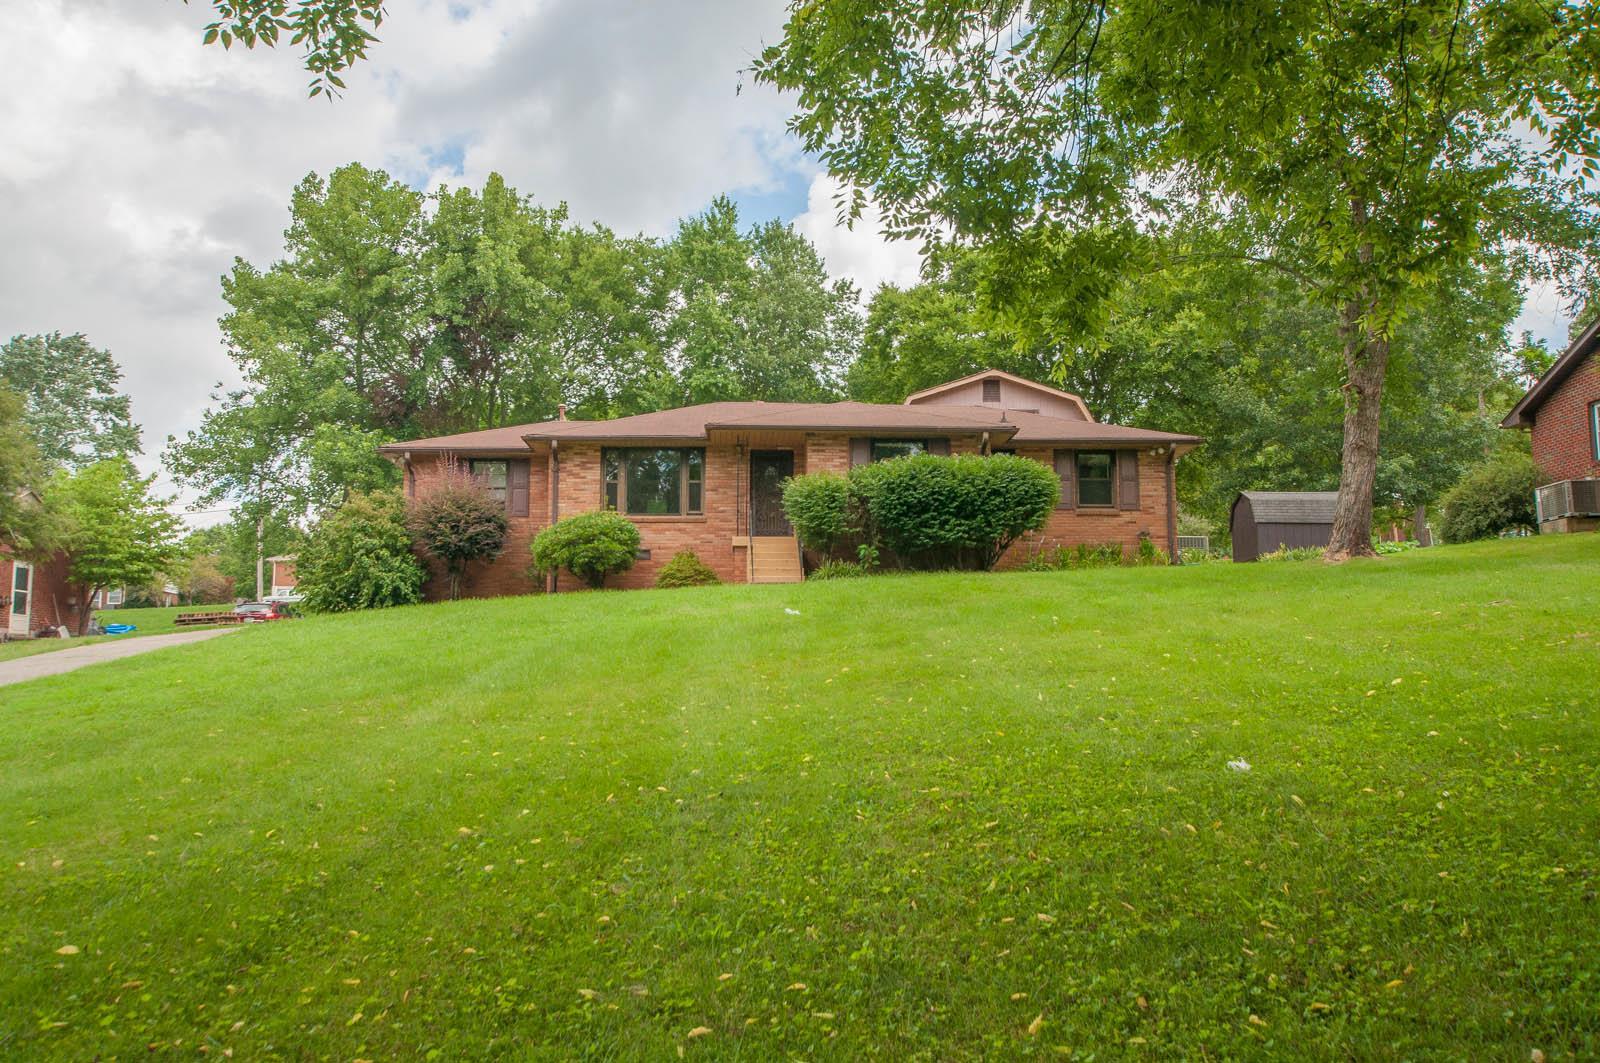 2426 Vale Ln, Nashville, TN 37214 - Nashville, TN real estate listing